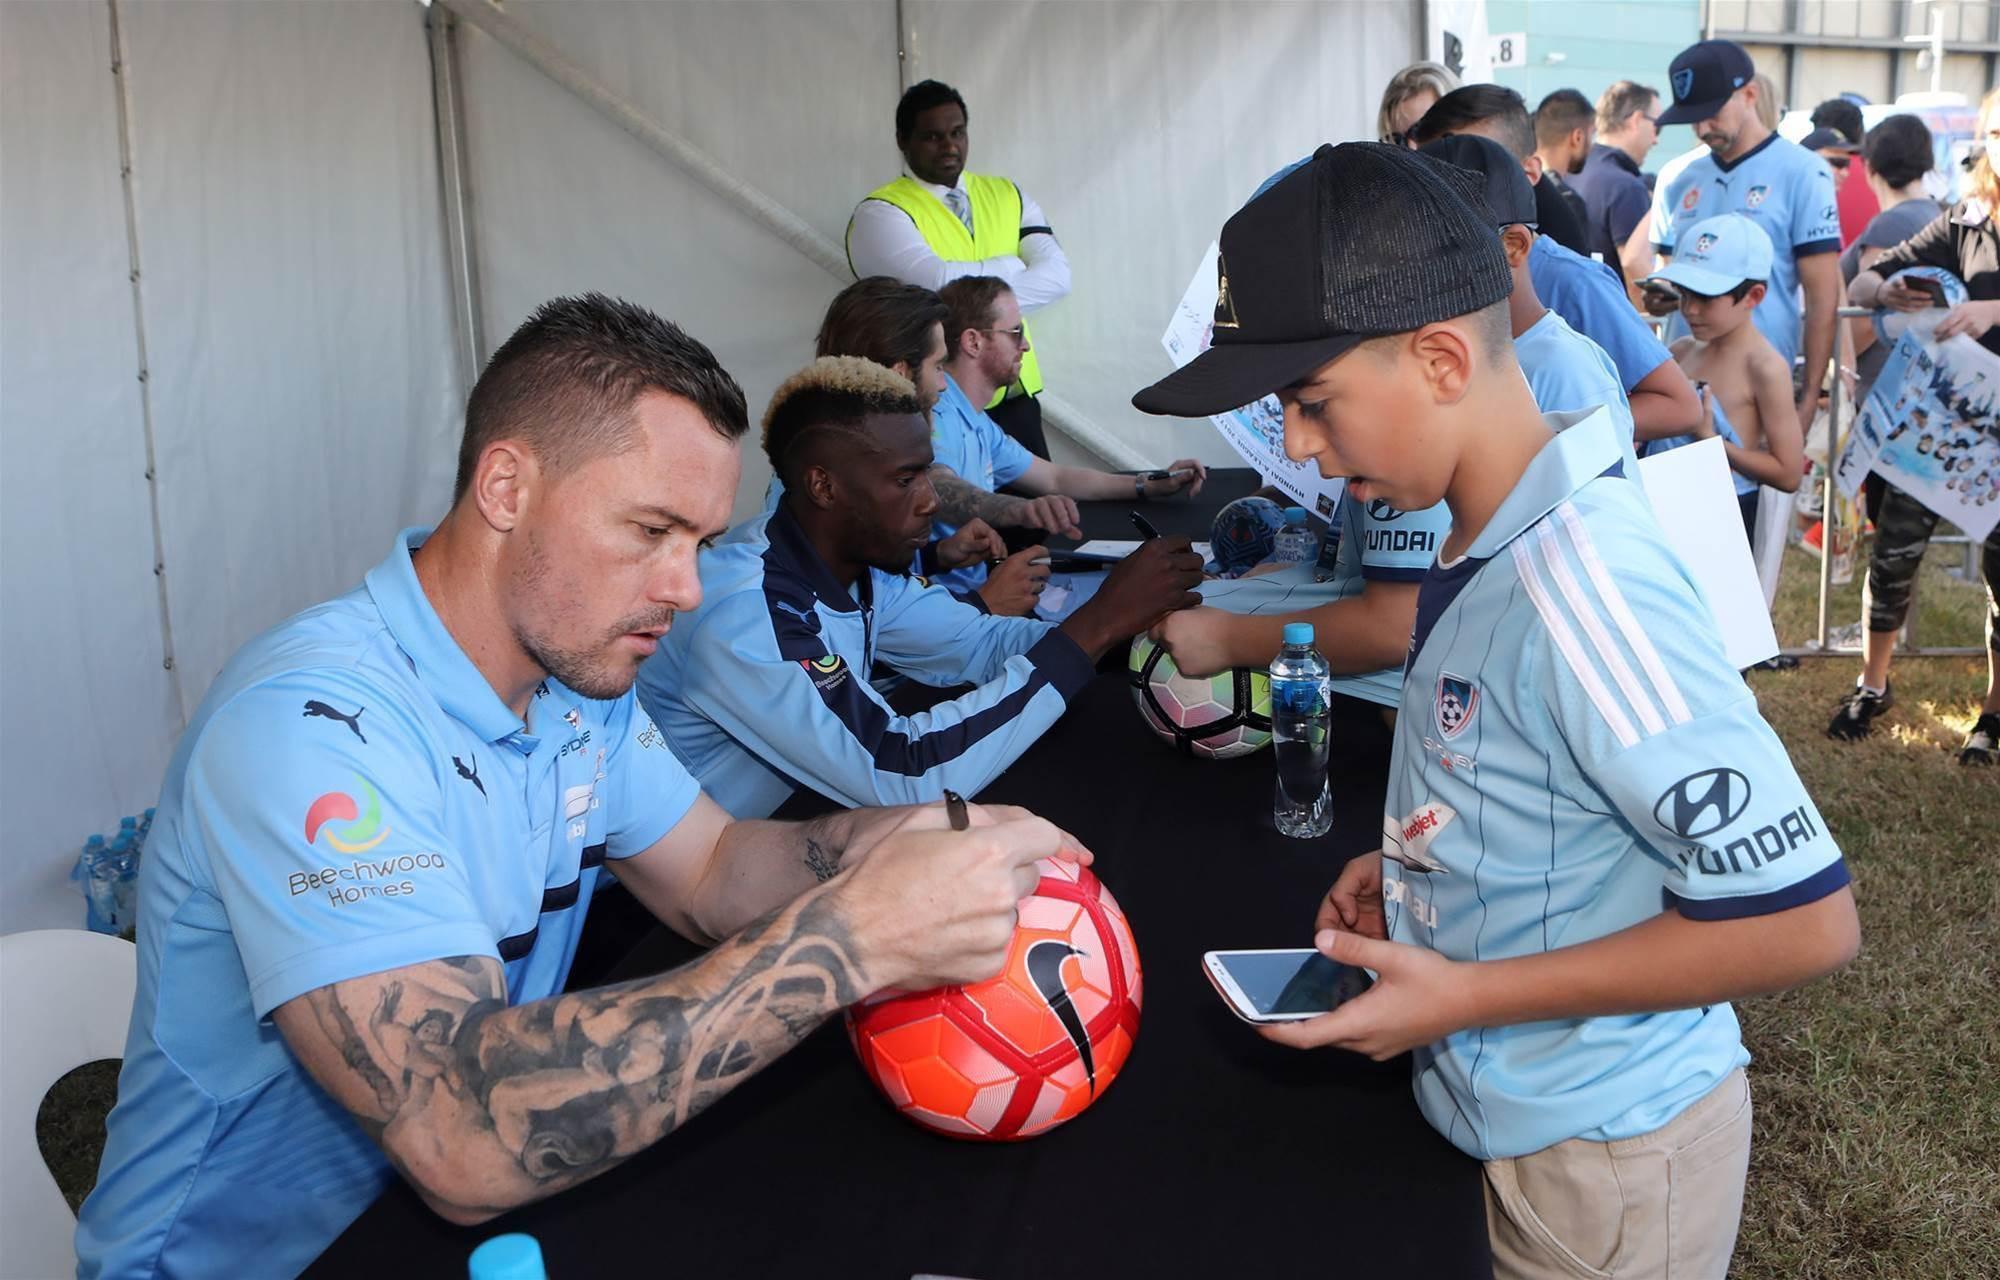 Pics: Sydney meet their fans